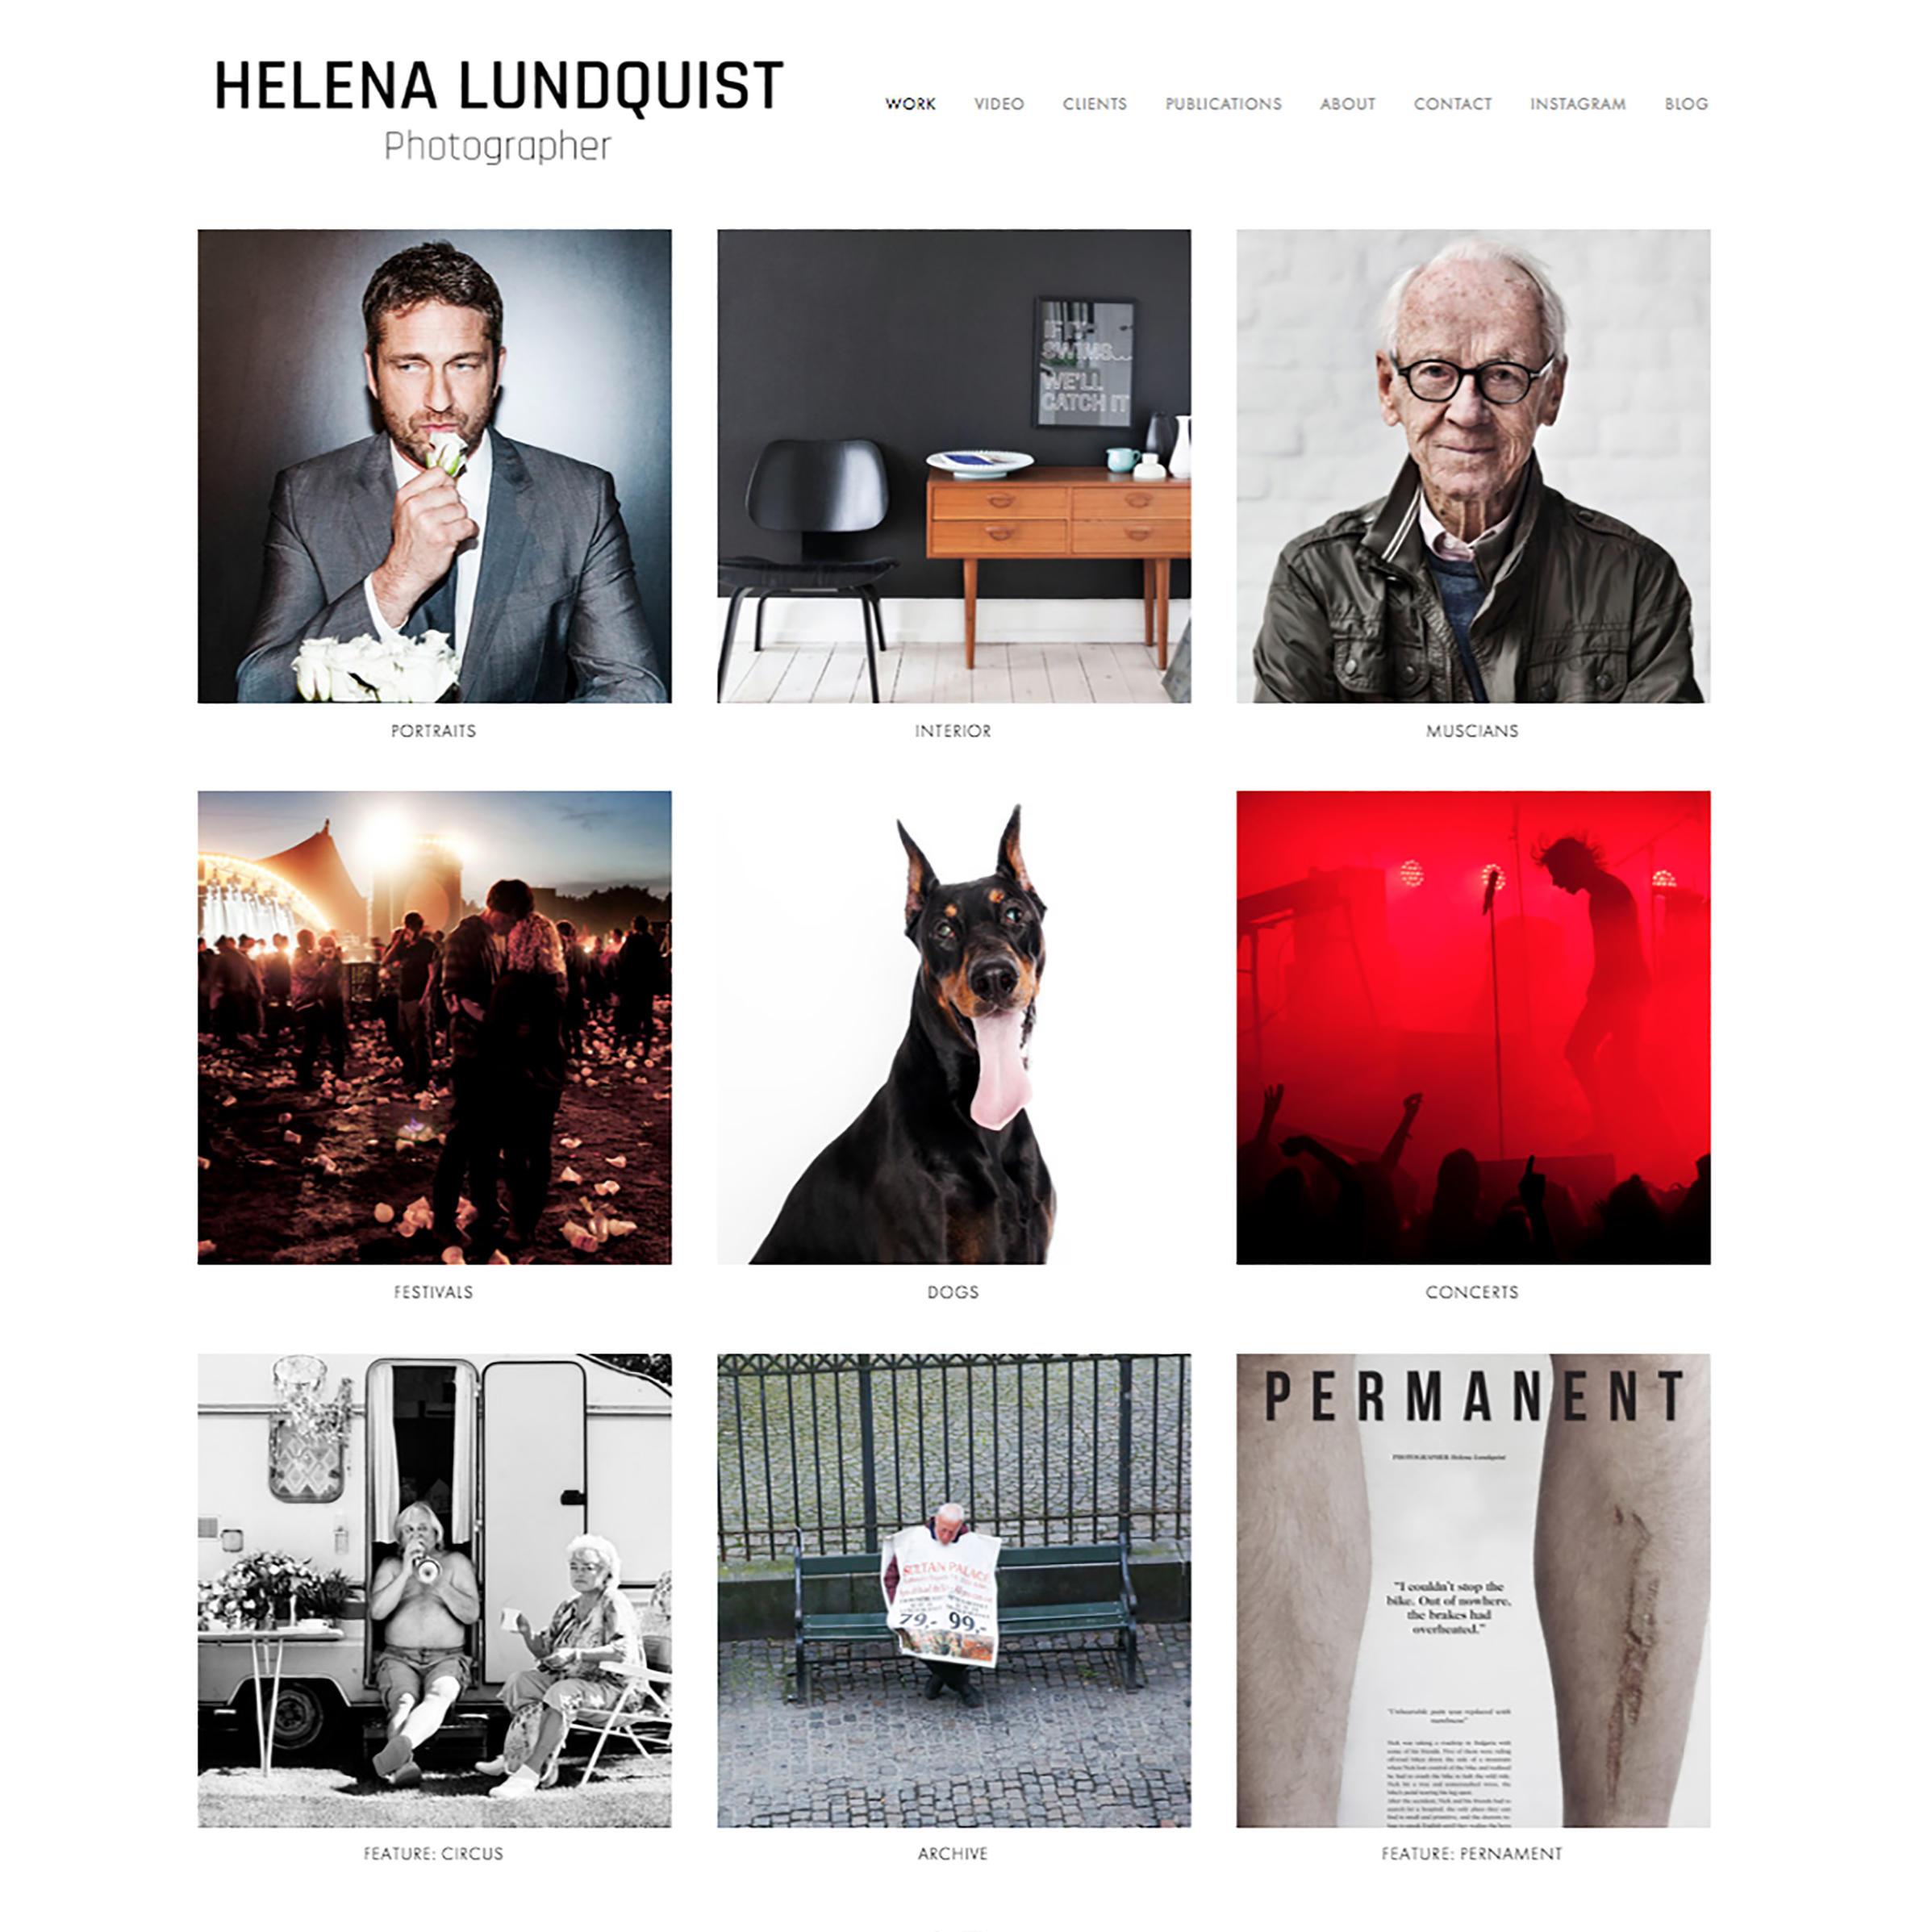 helenalundquist.dk